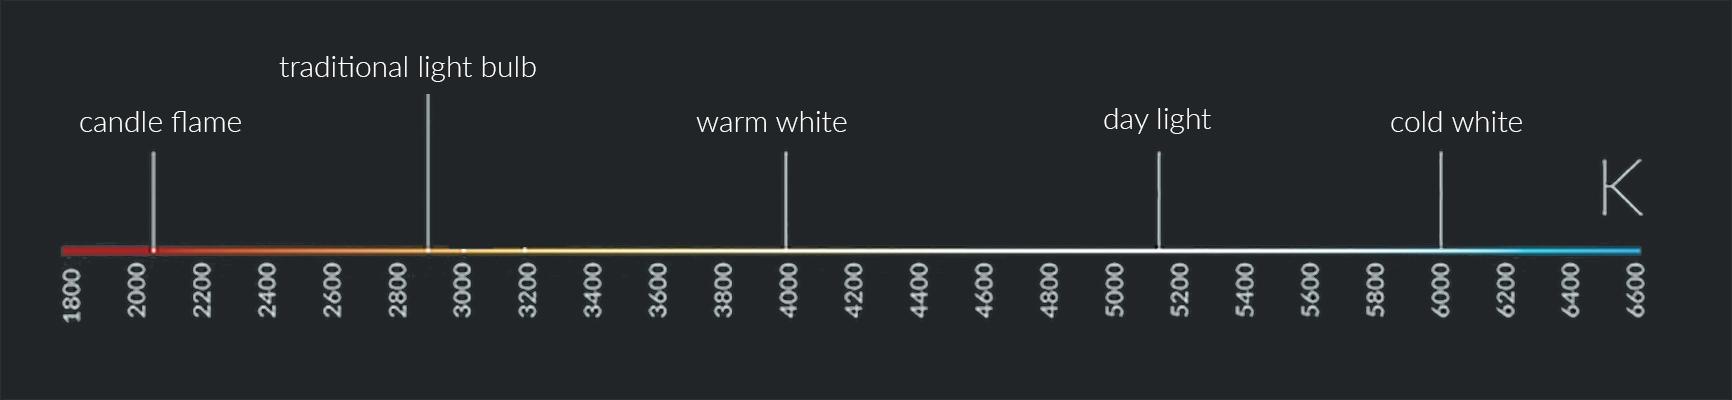 temp_wykres_EN